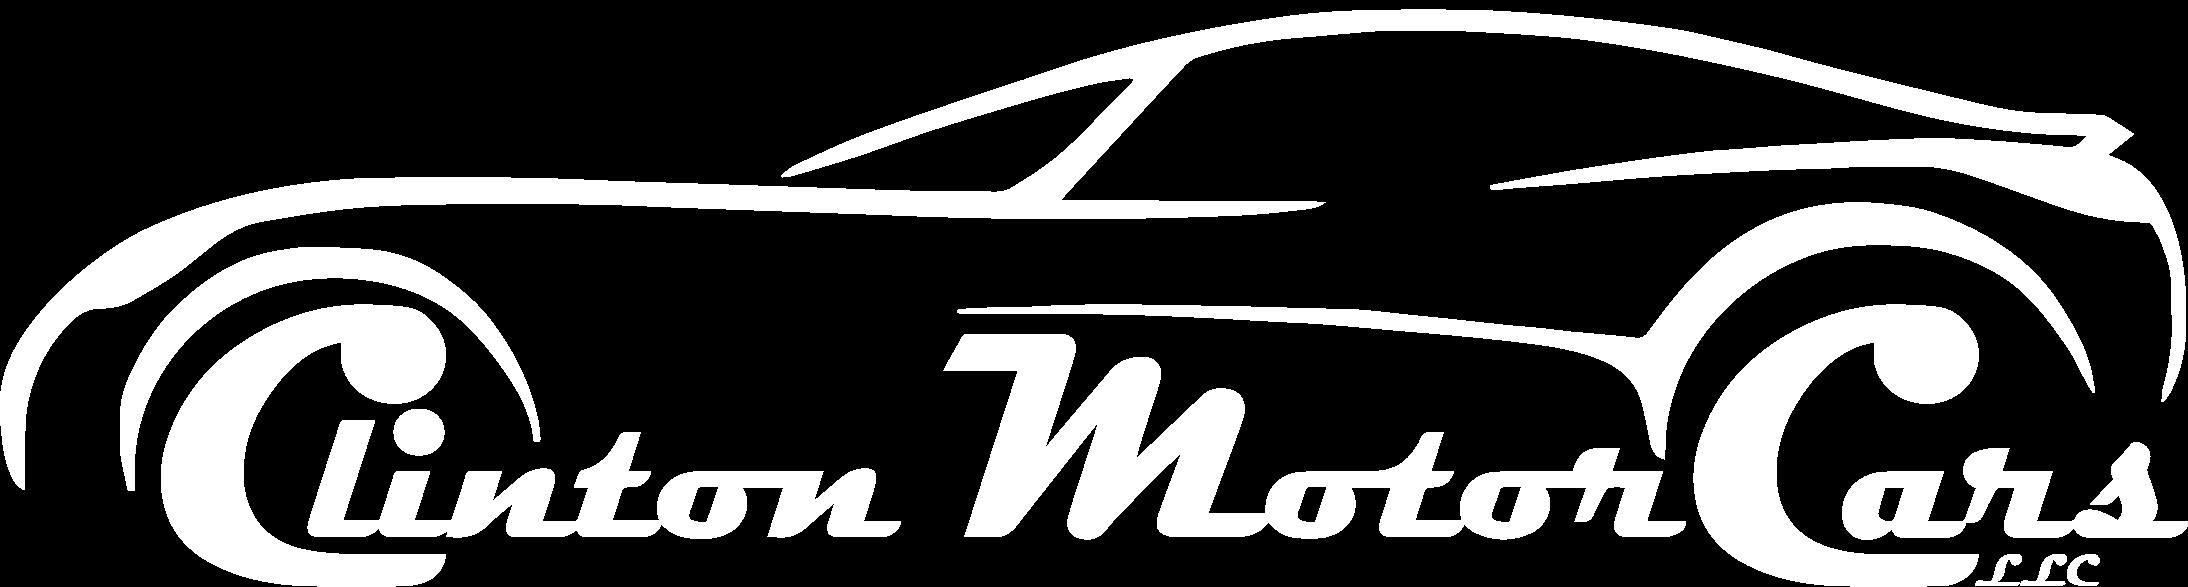 Clinton MotorCars